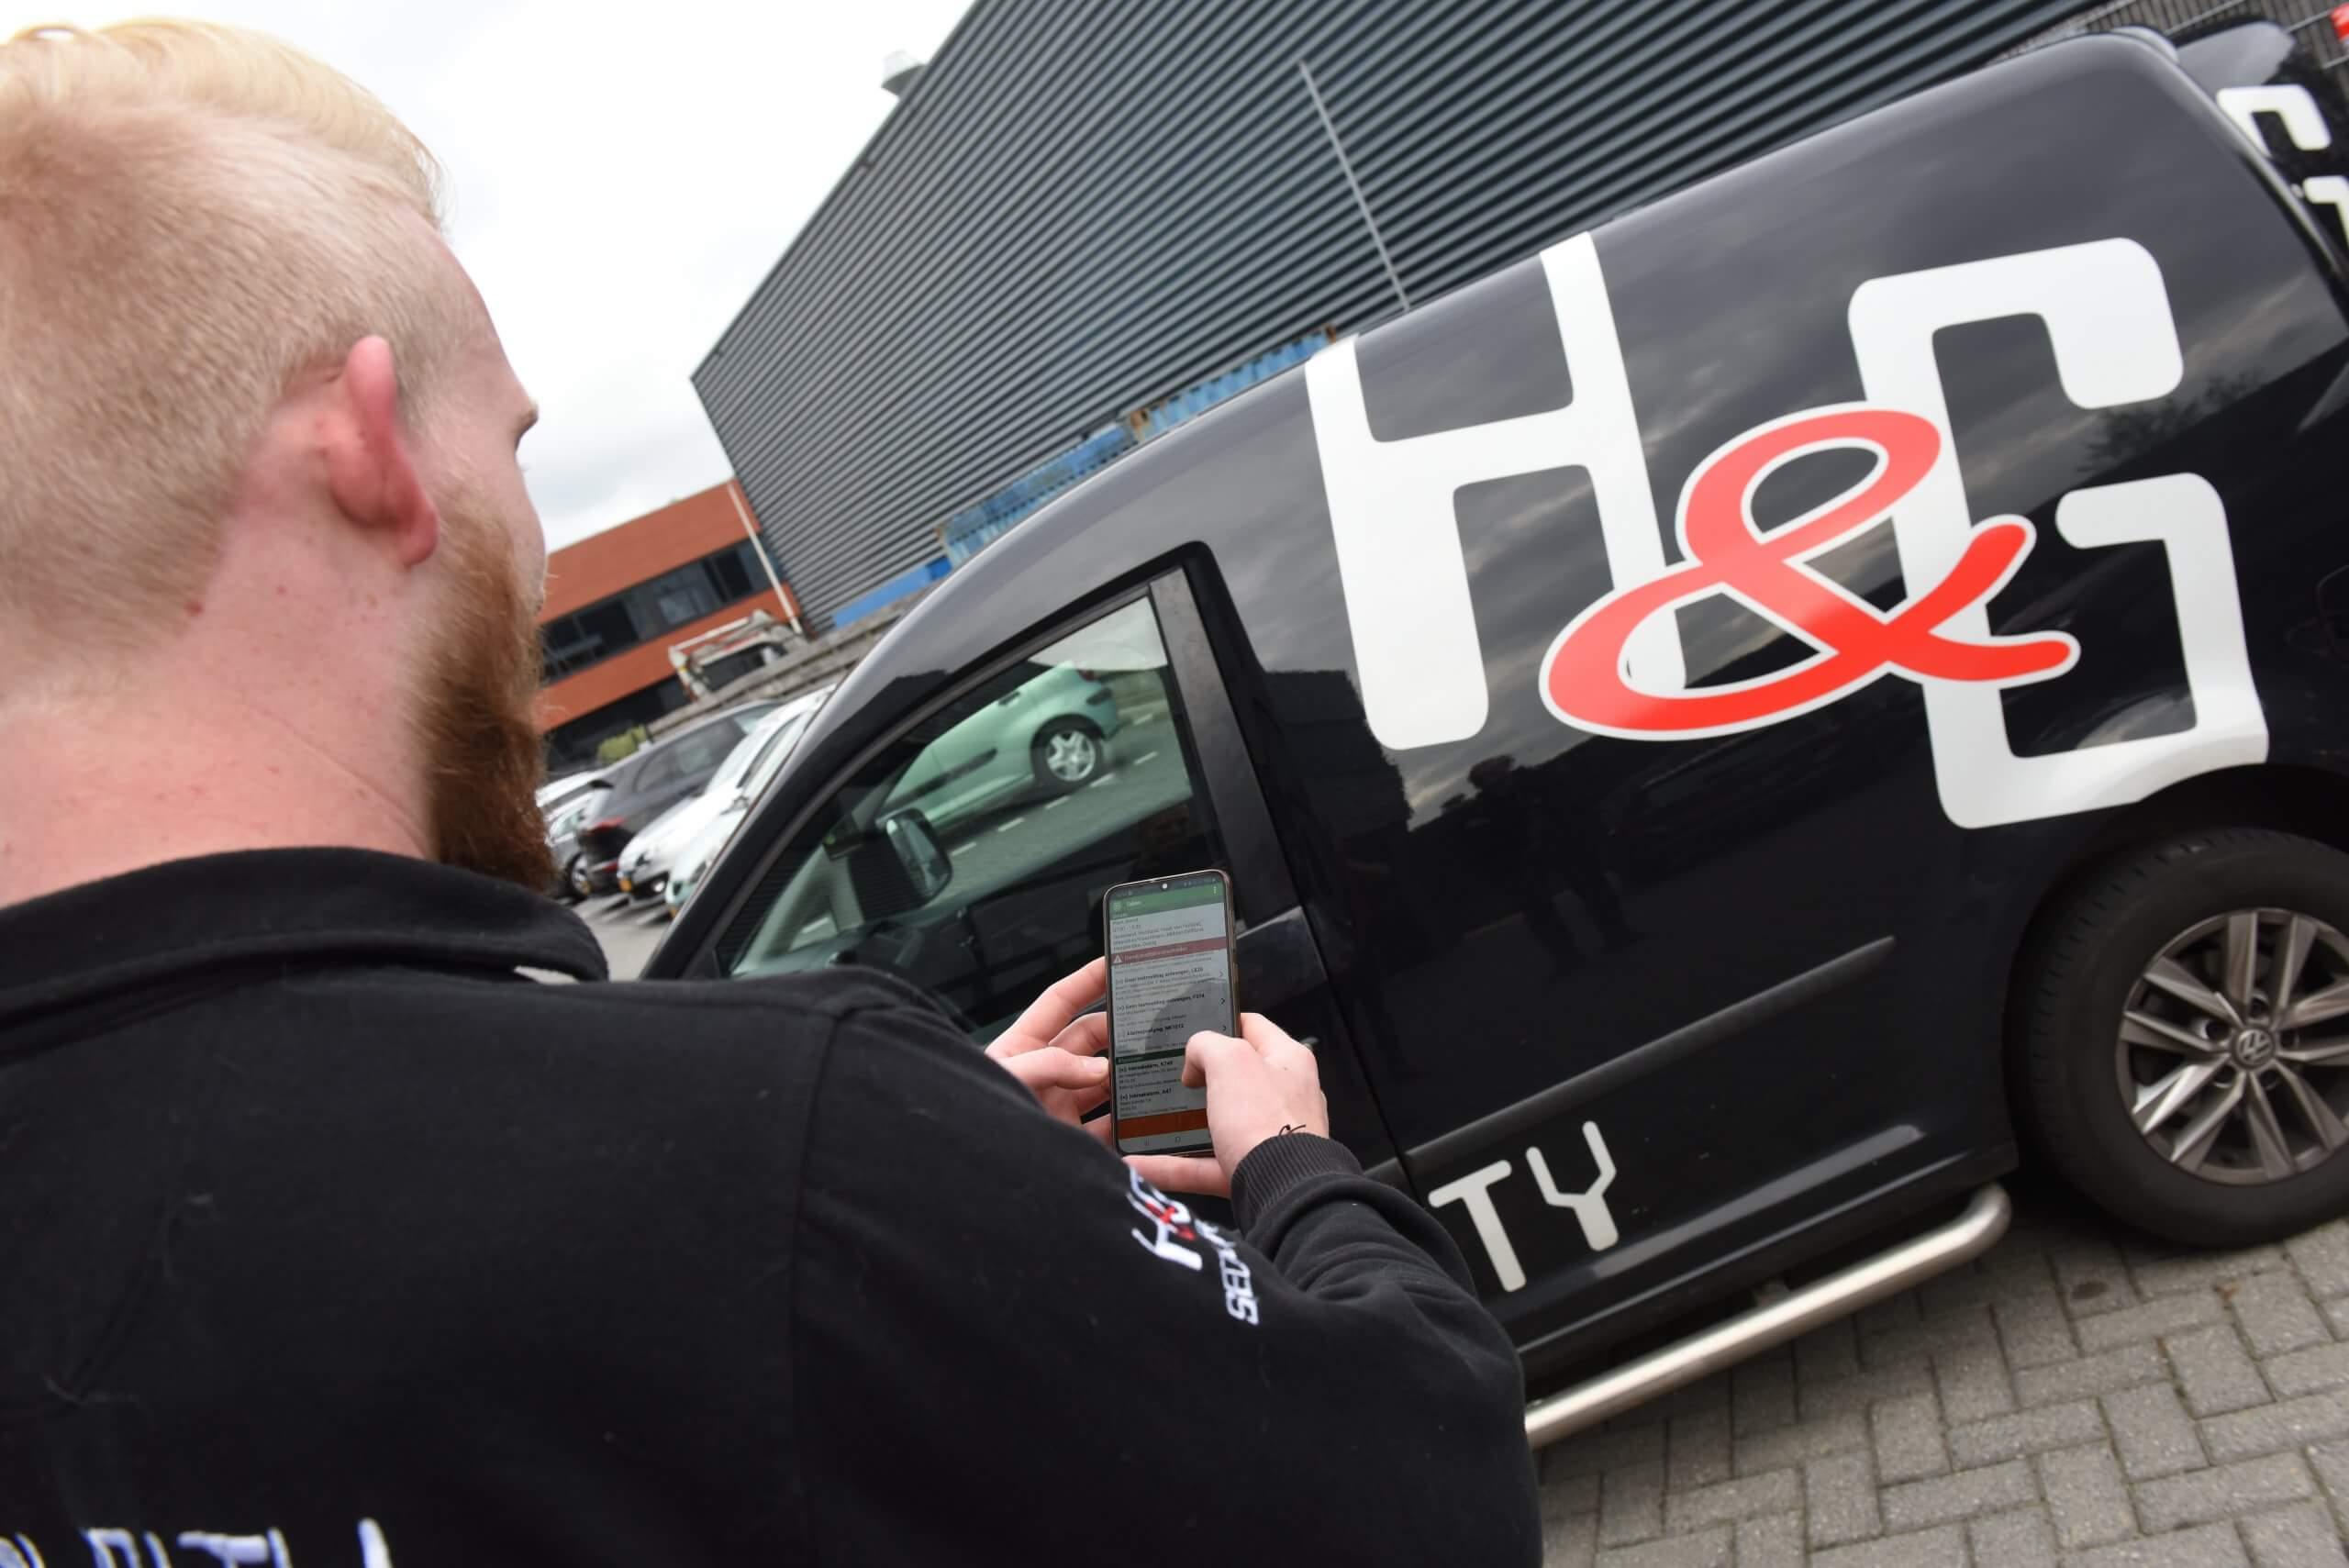 H&G Security app SequriX